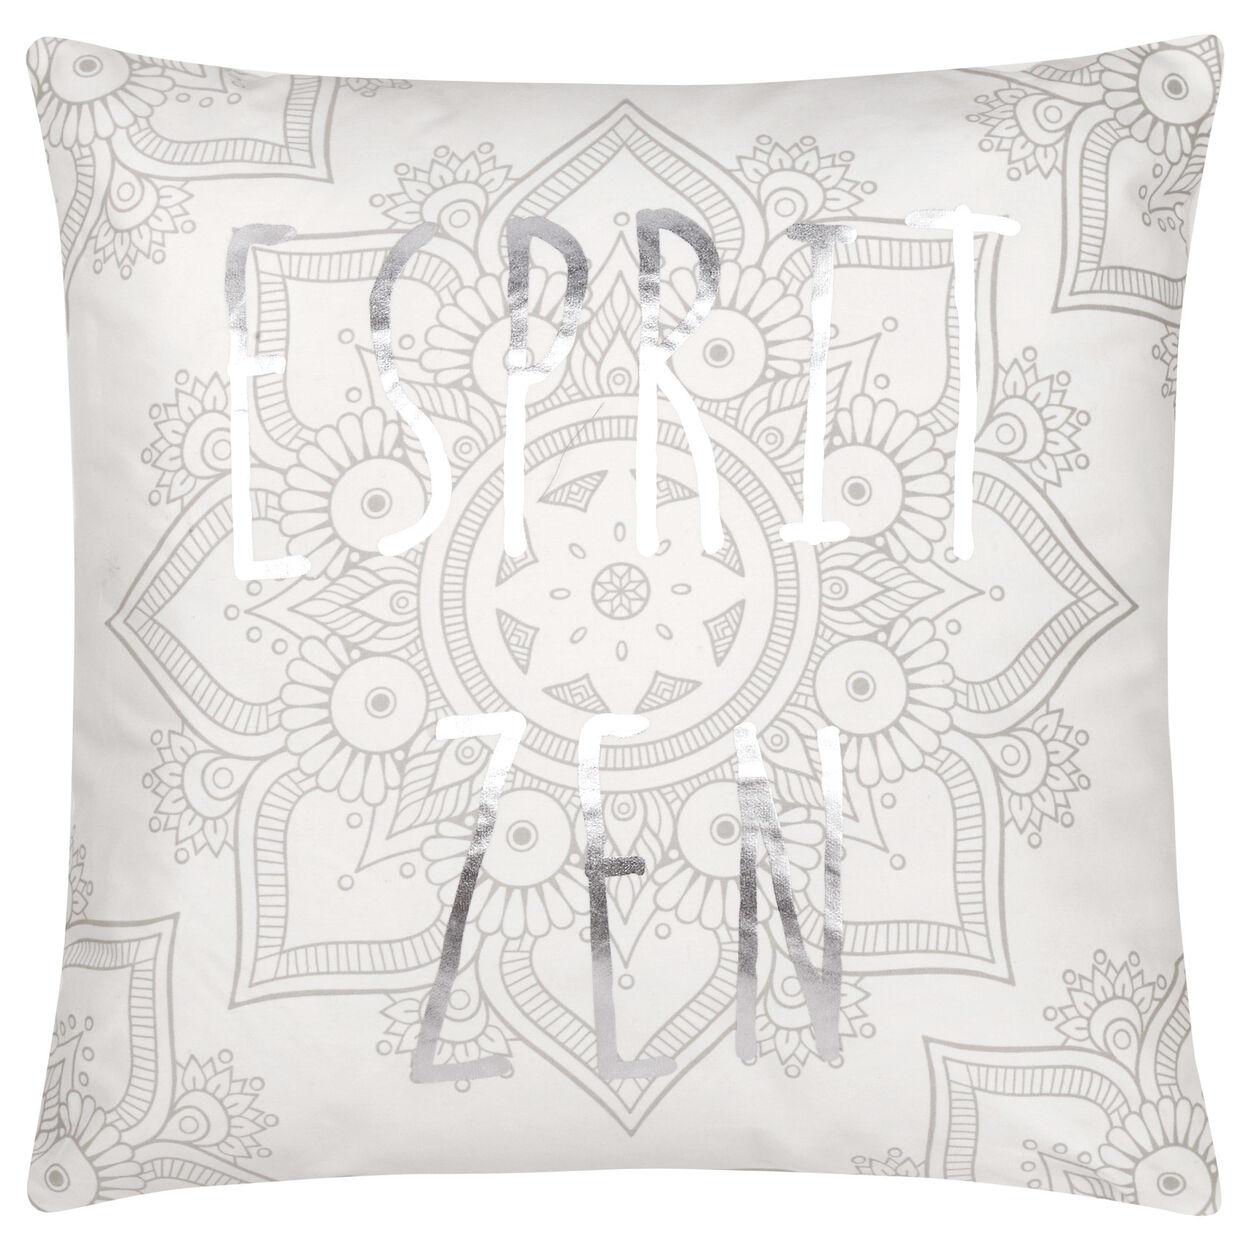 "Esprit Zen Decorative Pillow 18"" x 18"""